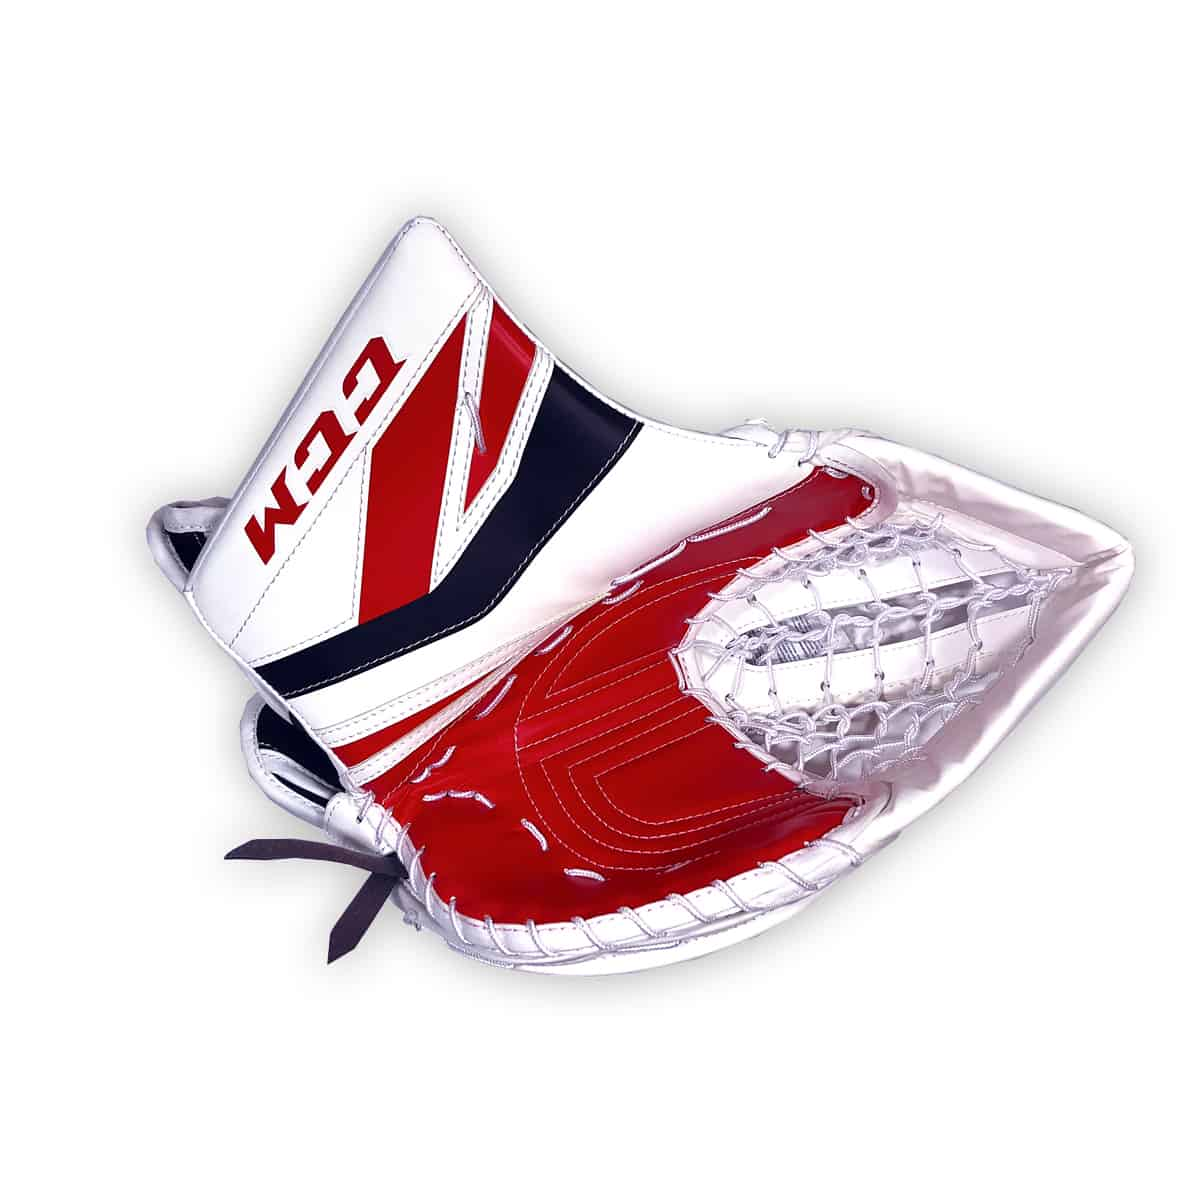 848f7e24571 CCM Premier P2.5 Senior Goalie Catch Glove in Chicago